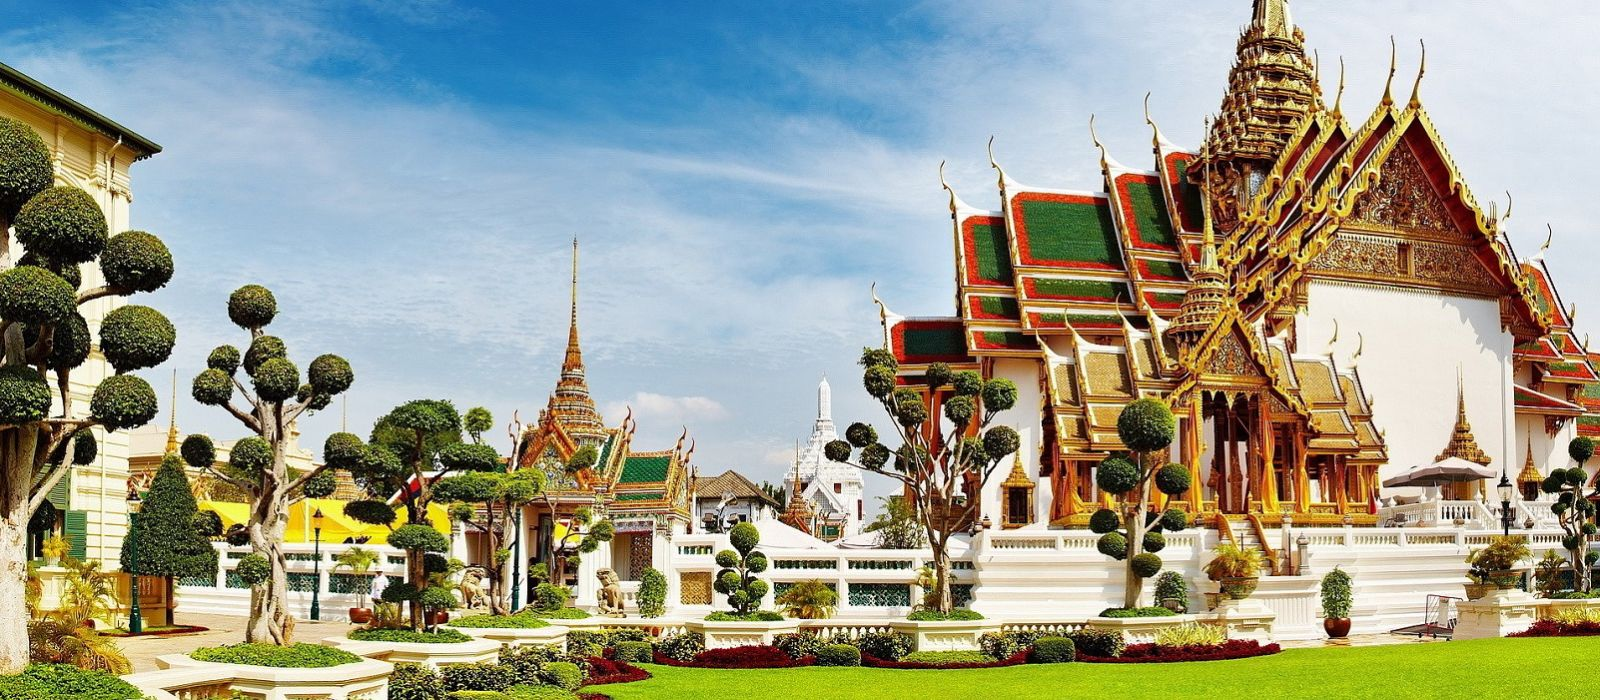 Luxury Bhutan & Thailand Paradise Islands Tour Trip 3